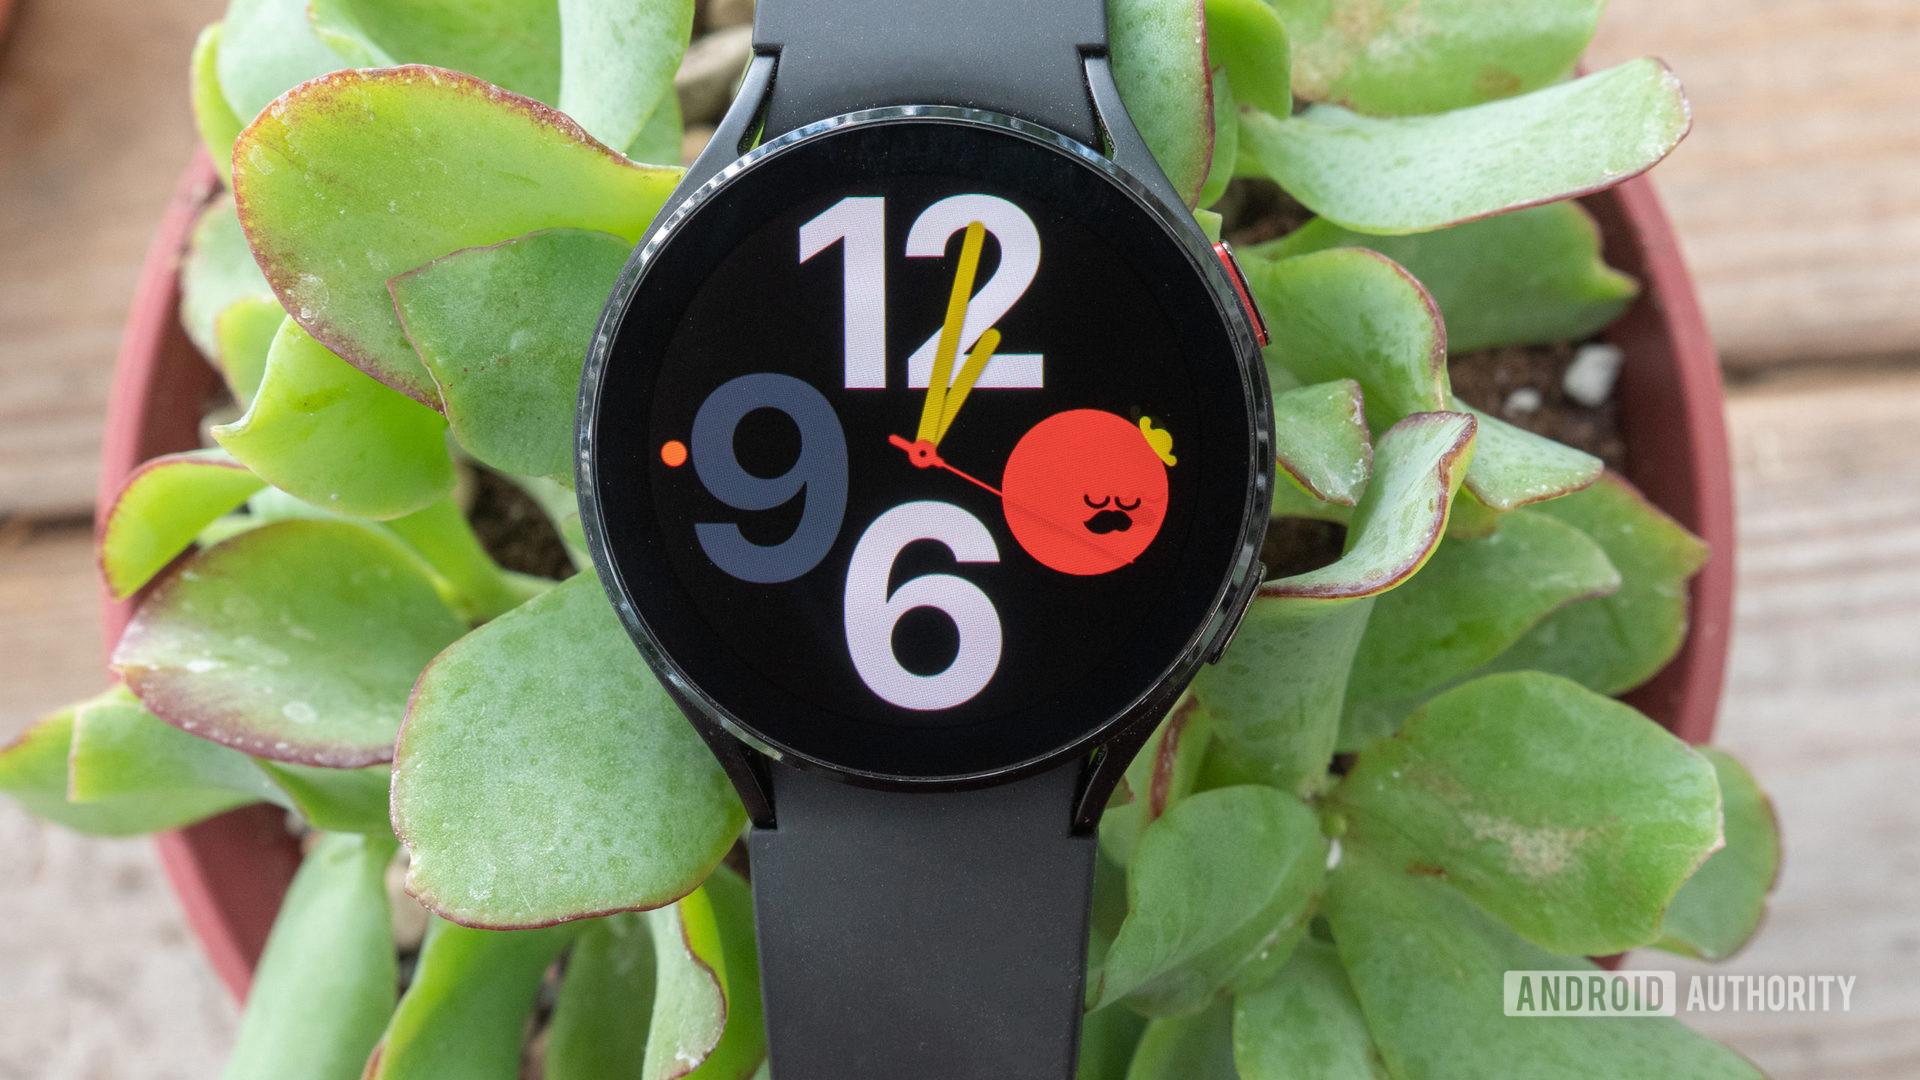 The Samsung Galaxy Watch 4 in a plant.